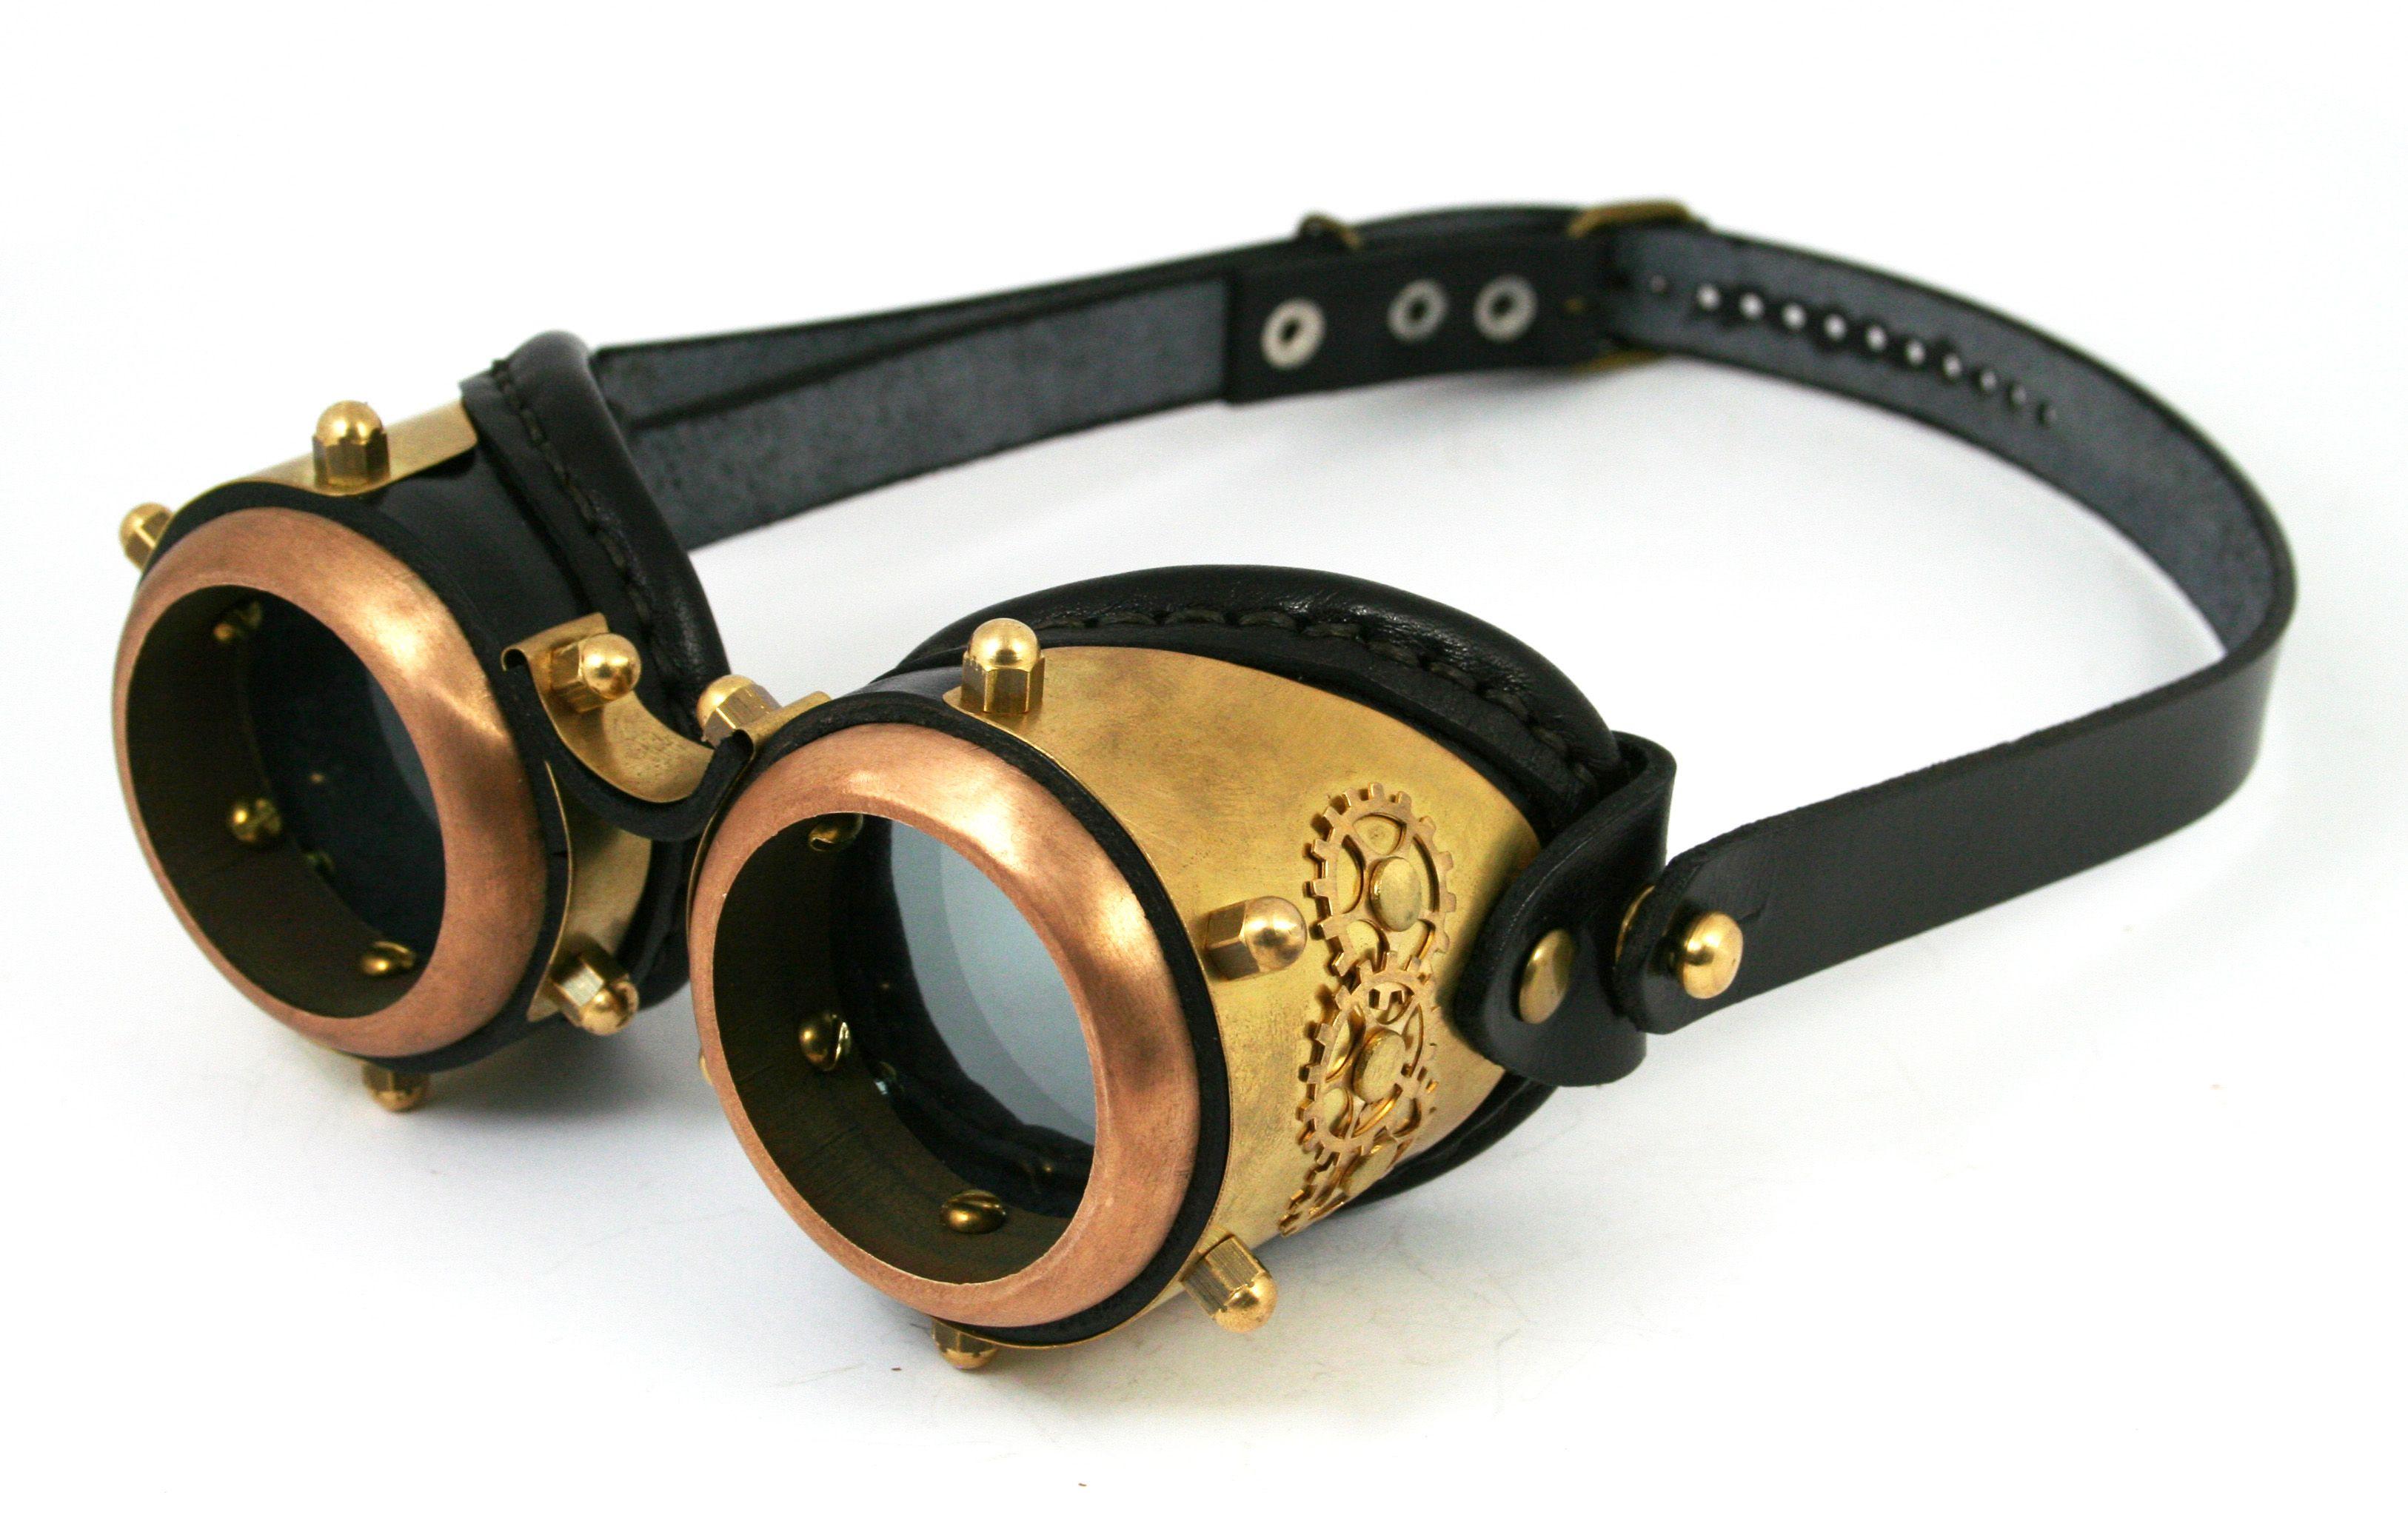 http://fc02.deviantart.net/fs70/f/2012/112/b/3/steampunk_goggles_black_leather_brass_plating__by_ambassadormann-d4wa8js.jpg